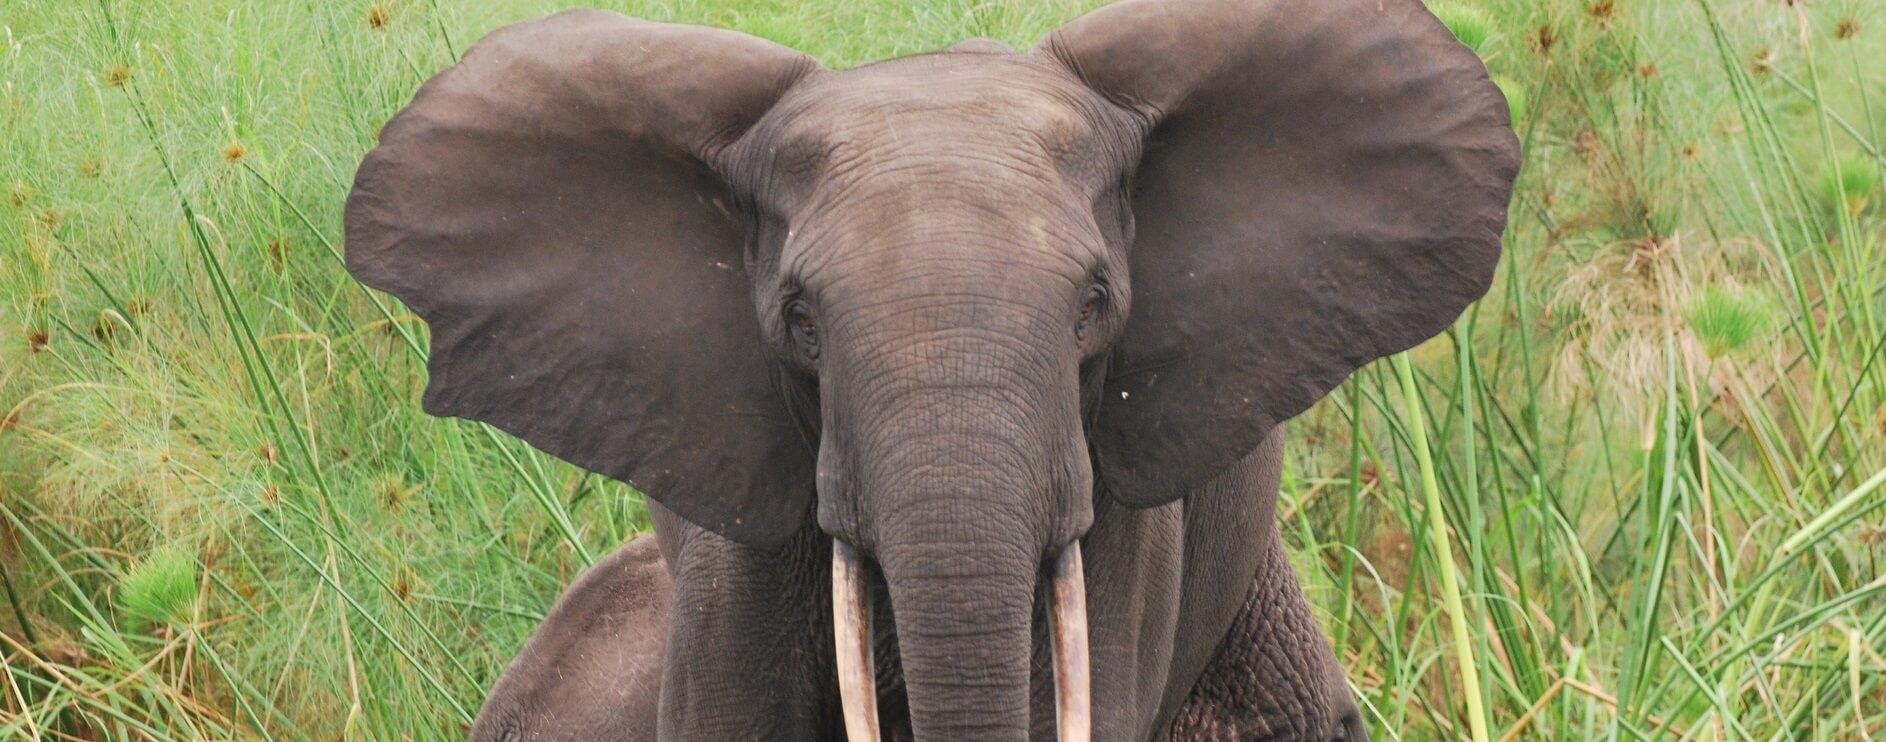 Elefanten am Strand